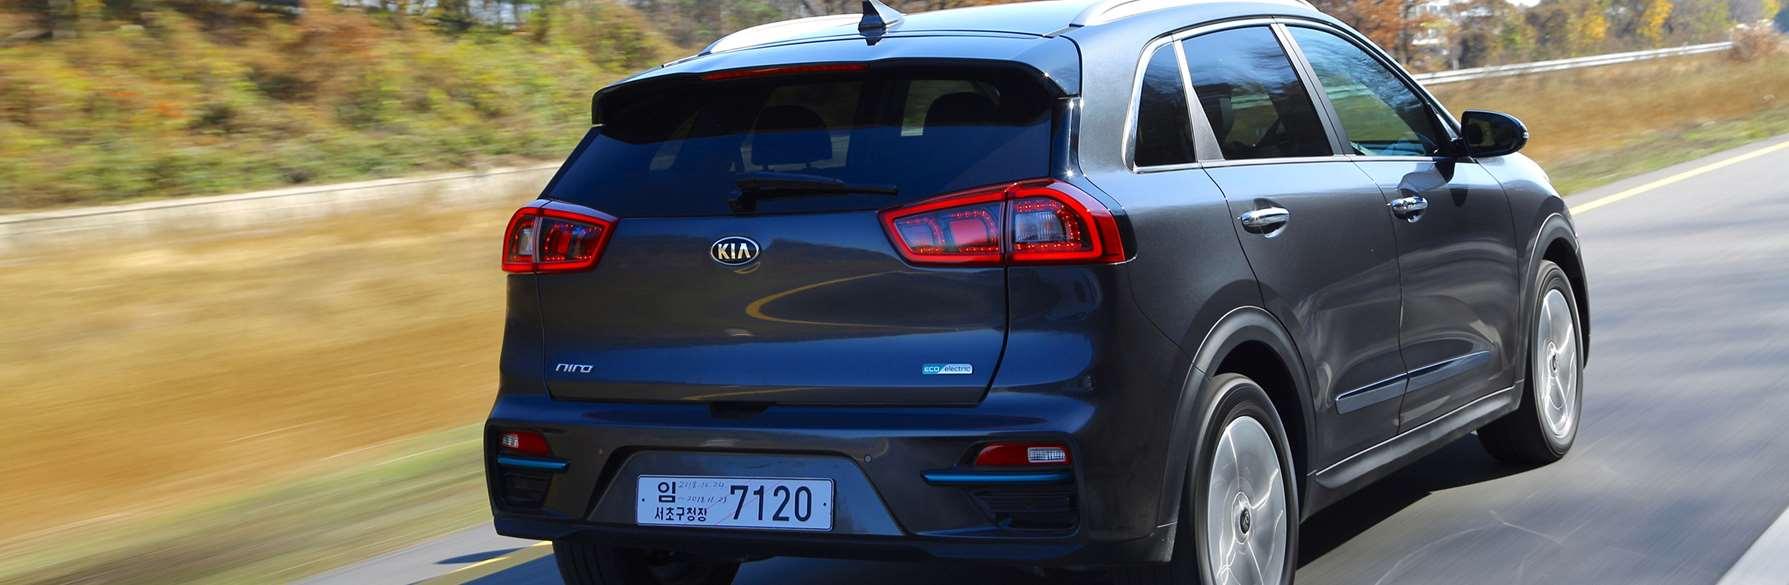 Kia Qatar Price 2021 - Car Wallpaper